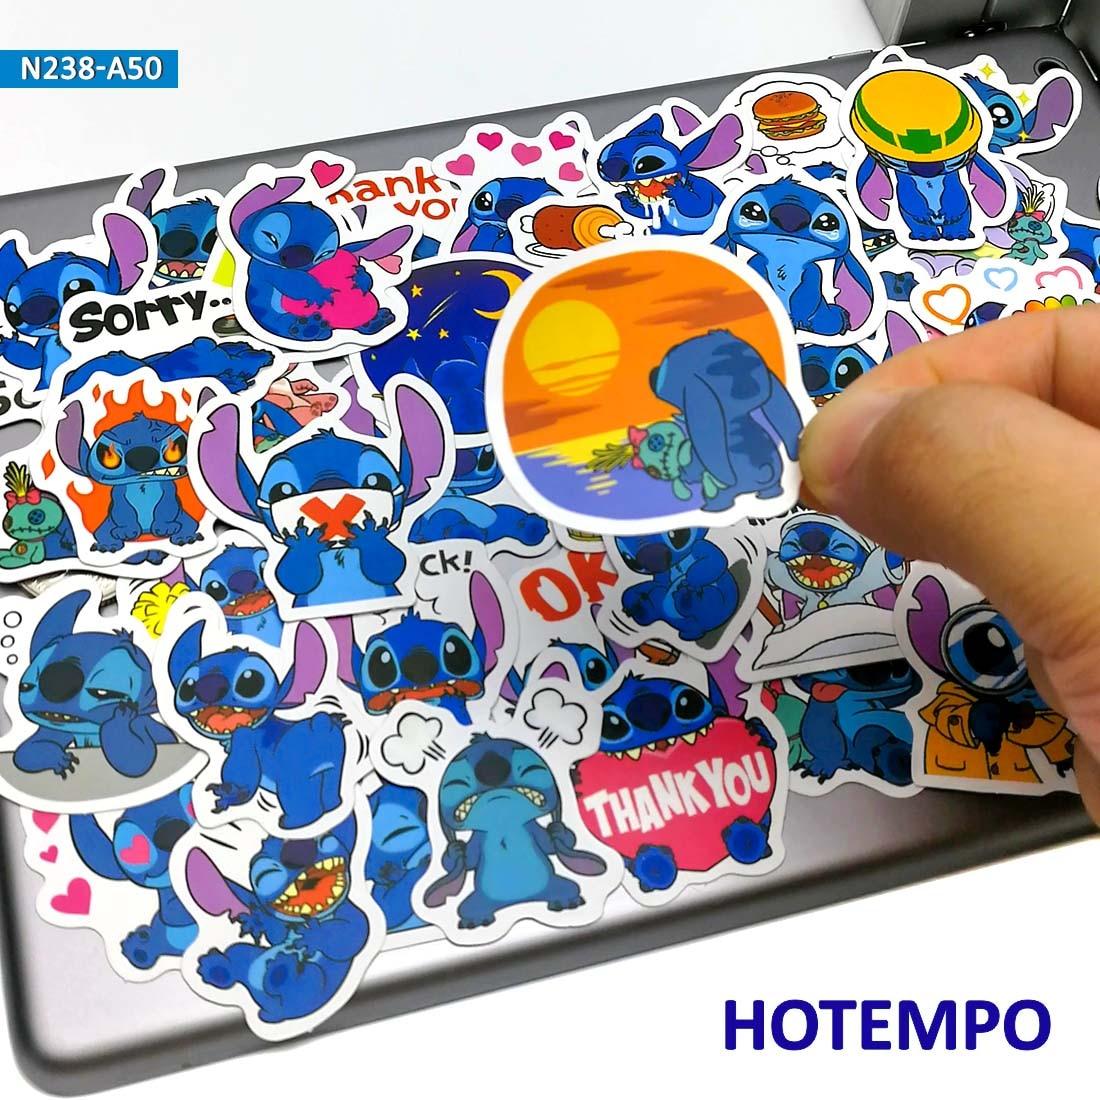 50pcs Cute Lilo Stitch Cartoon Stationery Anime Scrapbooking Stickers For Children Mobile Phone Laptop Guitar Skateboard Sticker